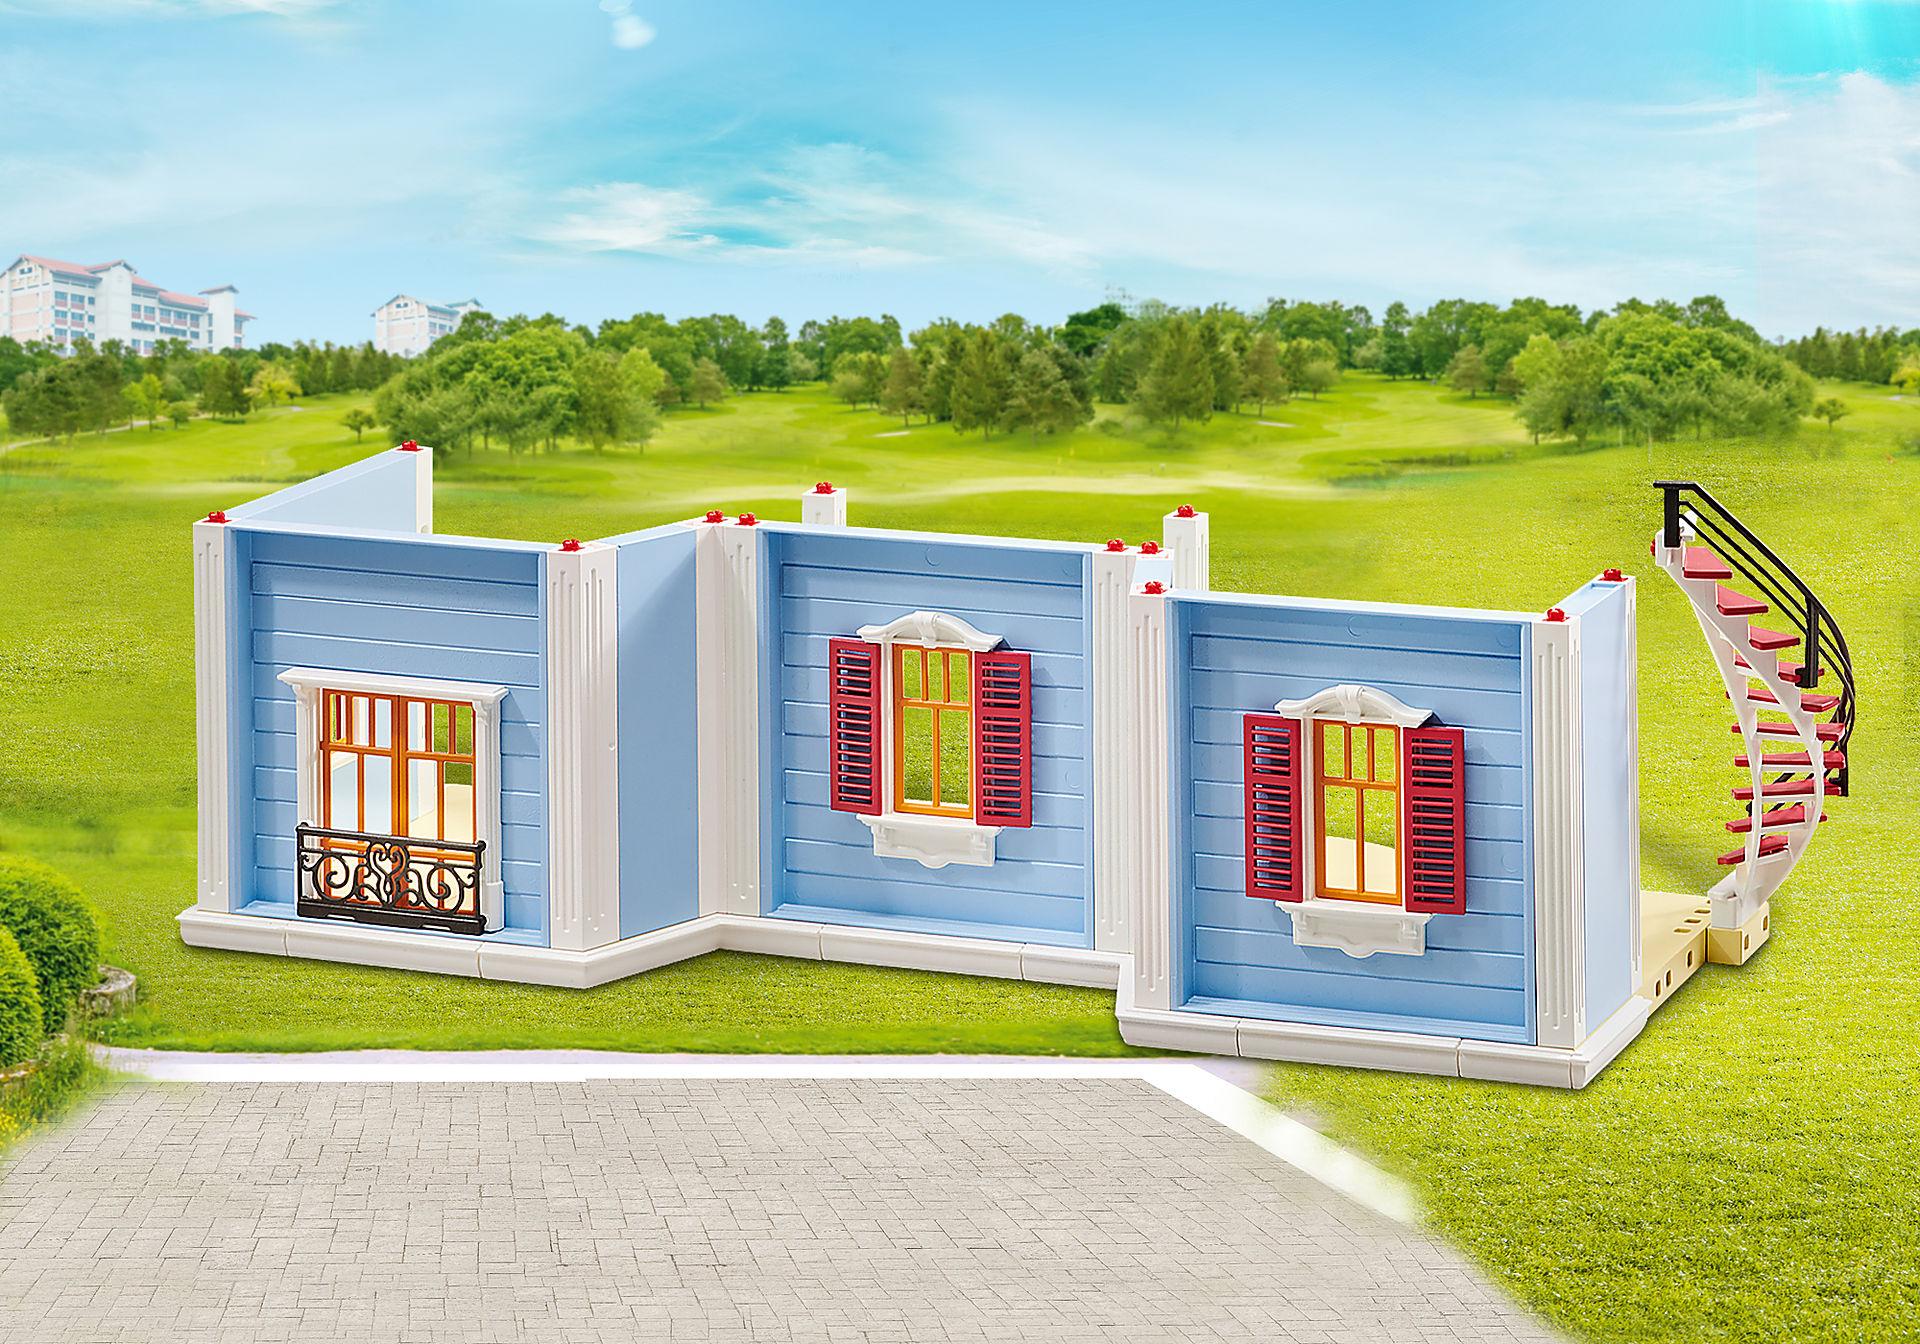 http://media.playmobil.com/i/playmobil/9849_product_detail/Extra verdieping voor het Groot herenhuis